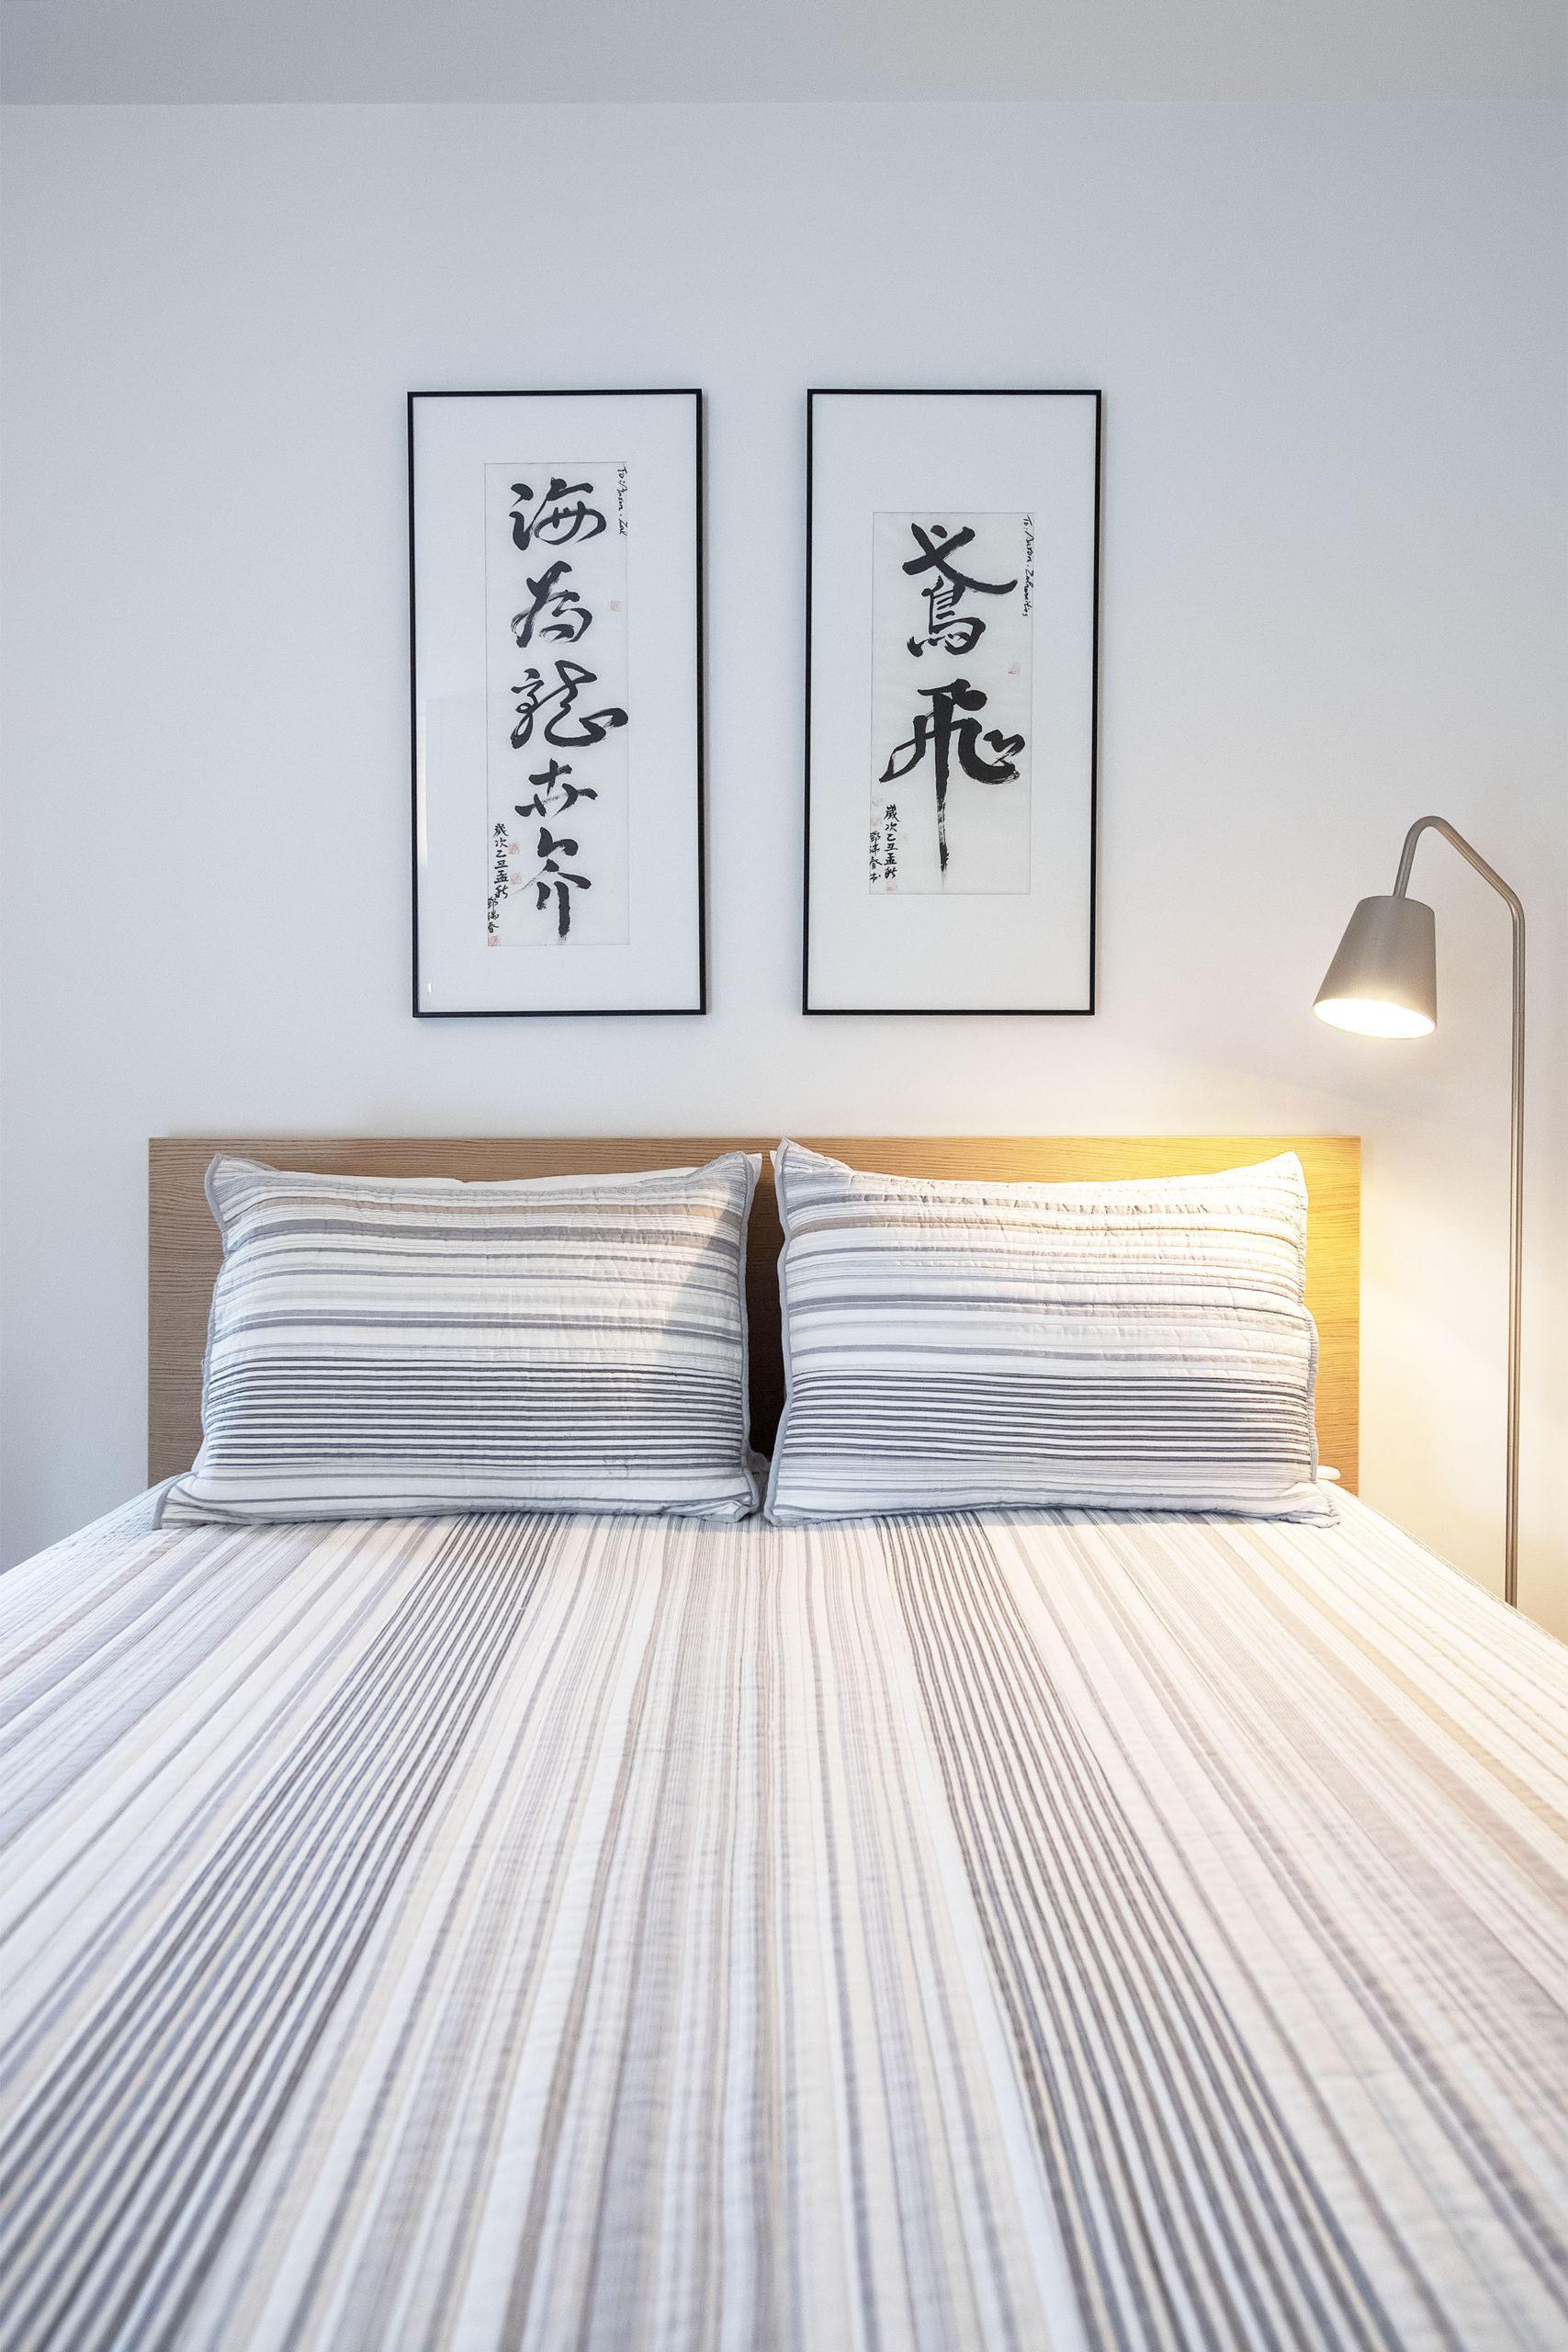 Calligraphy in the Milestone bedroom.